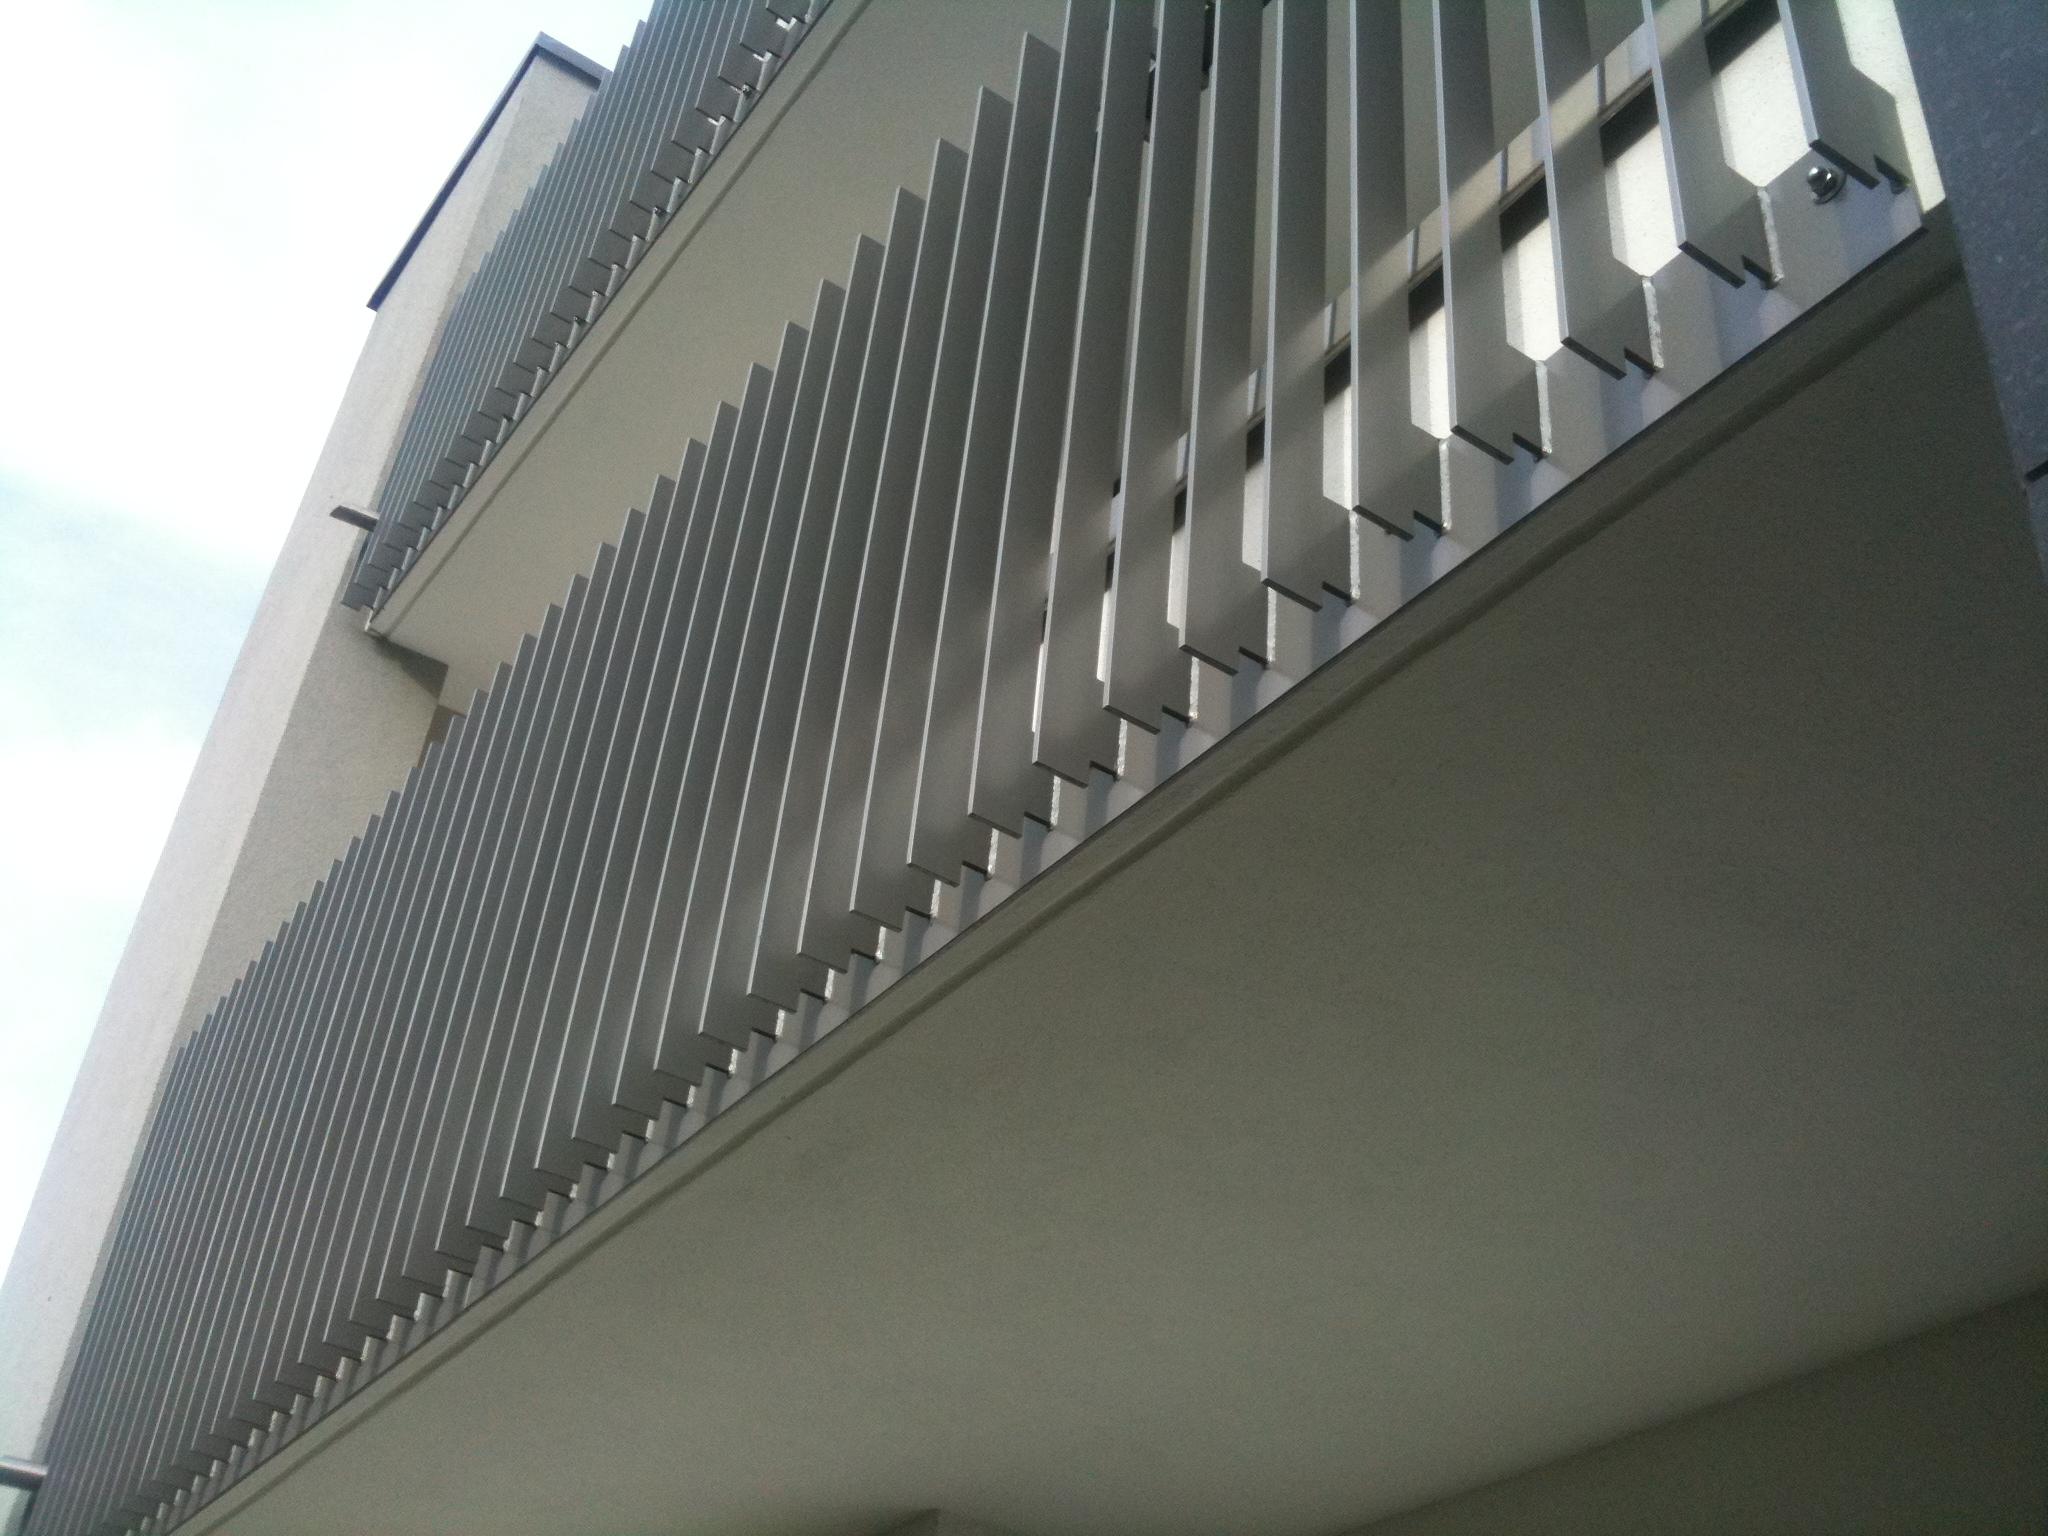 aluminium flachstahl gel nder preis auf anfrage metall kreativ ug shop. Black Bedroom Furniture Sets. Home Design Ideas